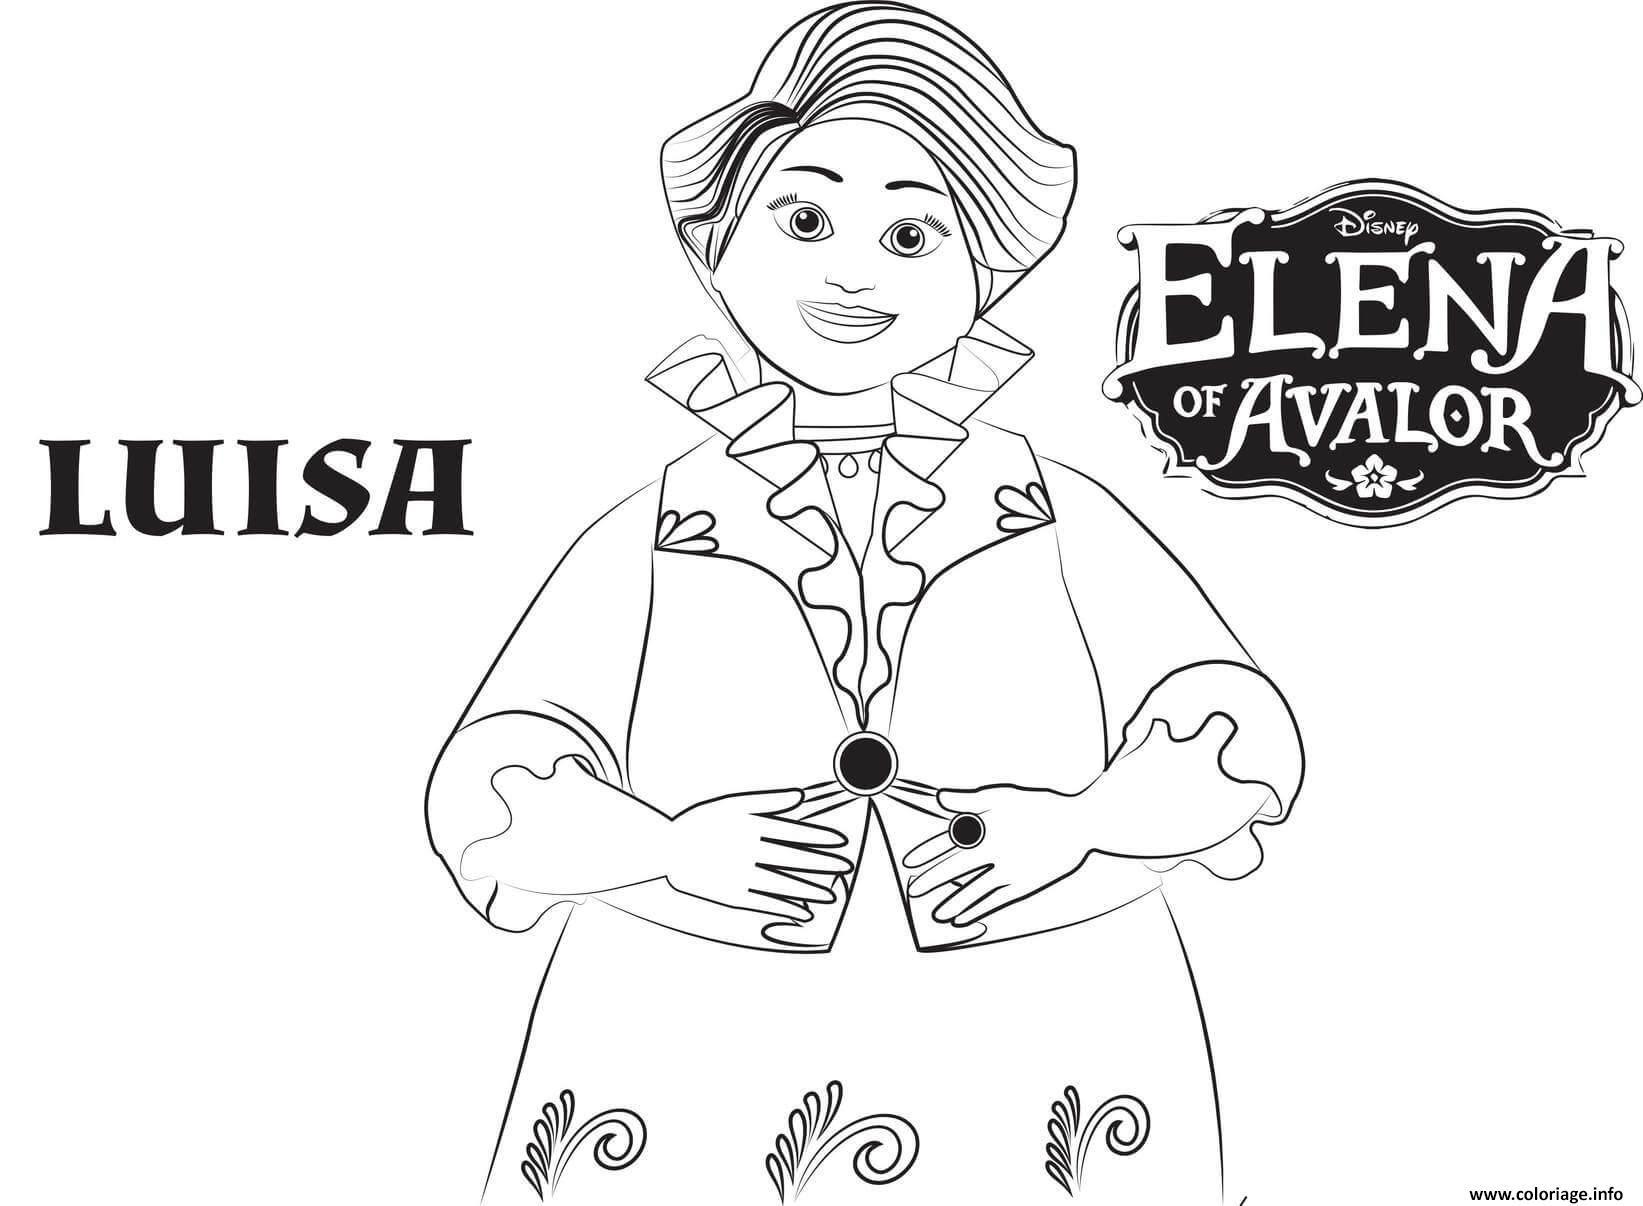 Coloriage Elena Of Avalor Luisa Disney Jecoloriecom